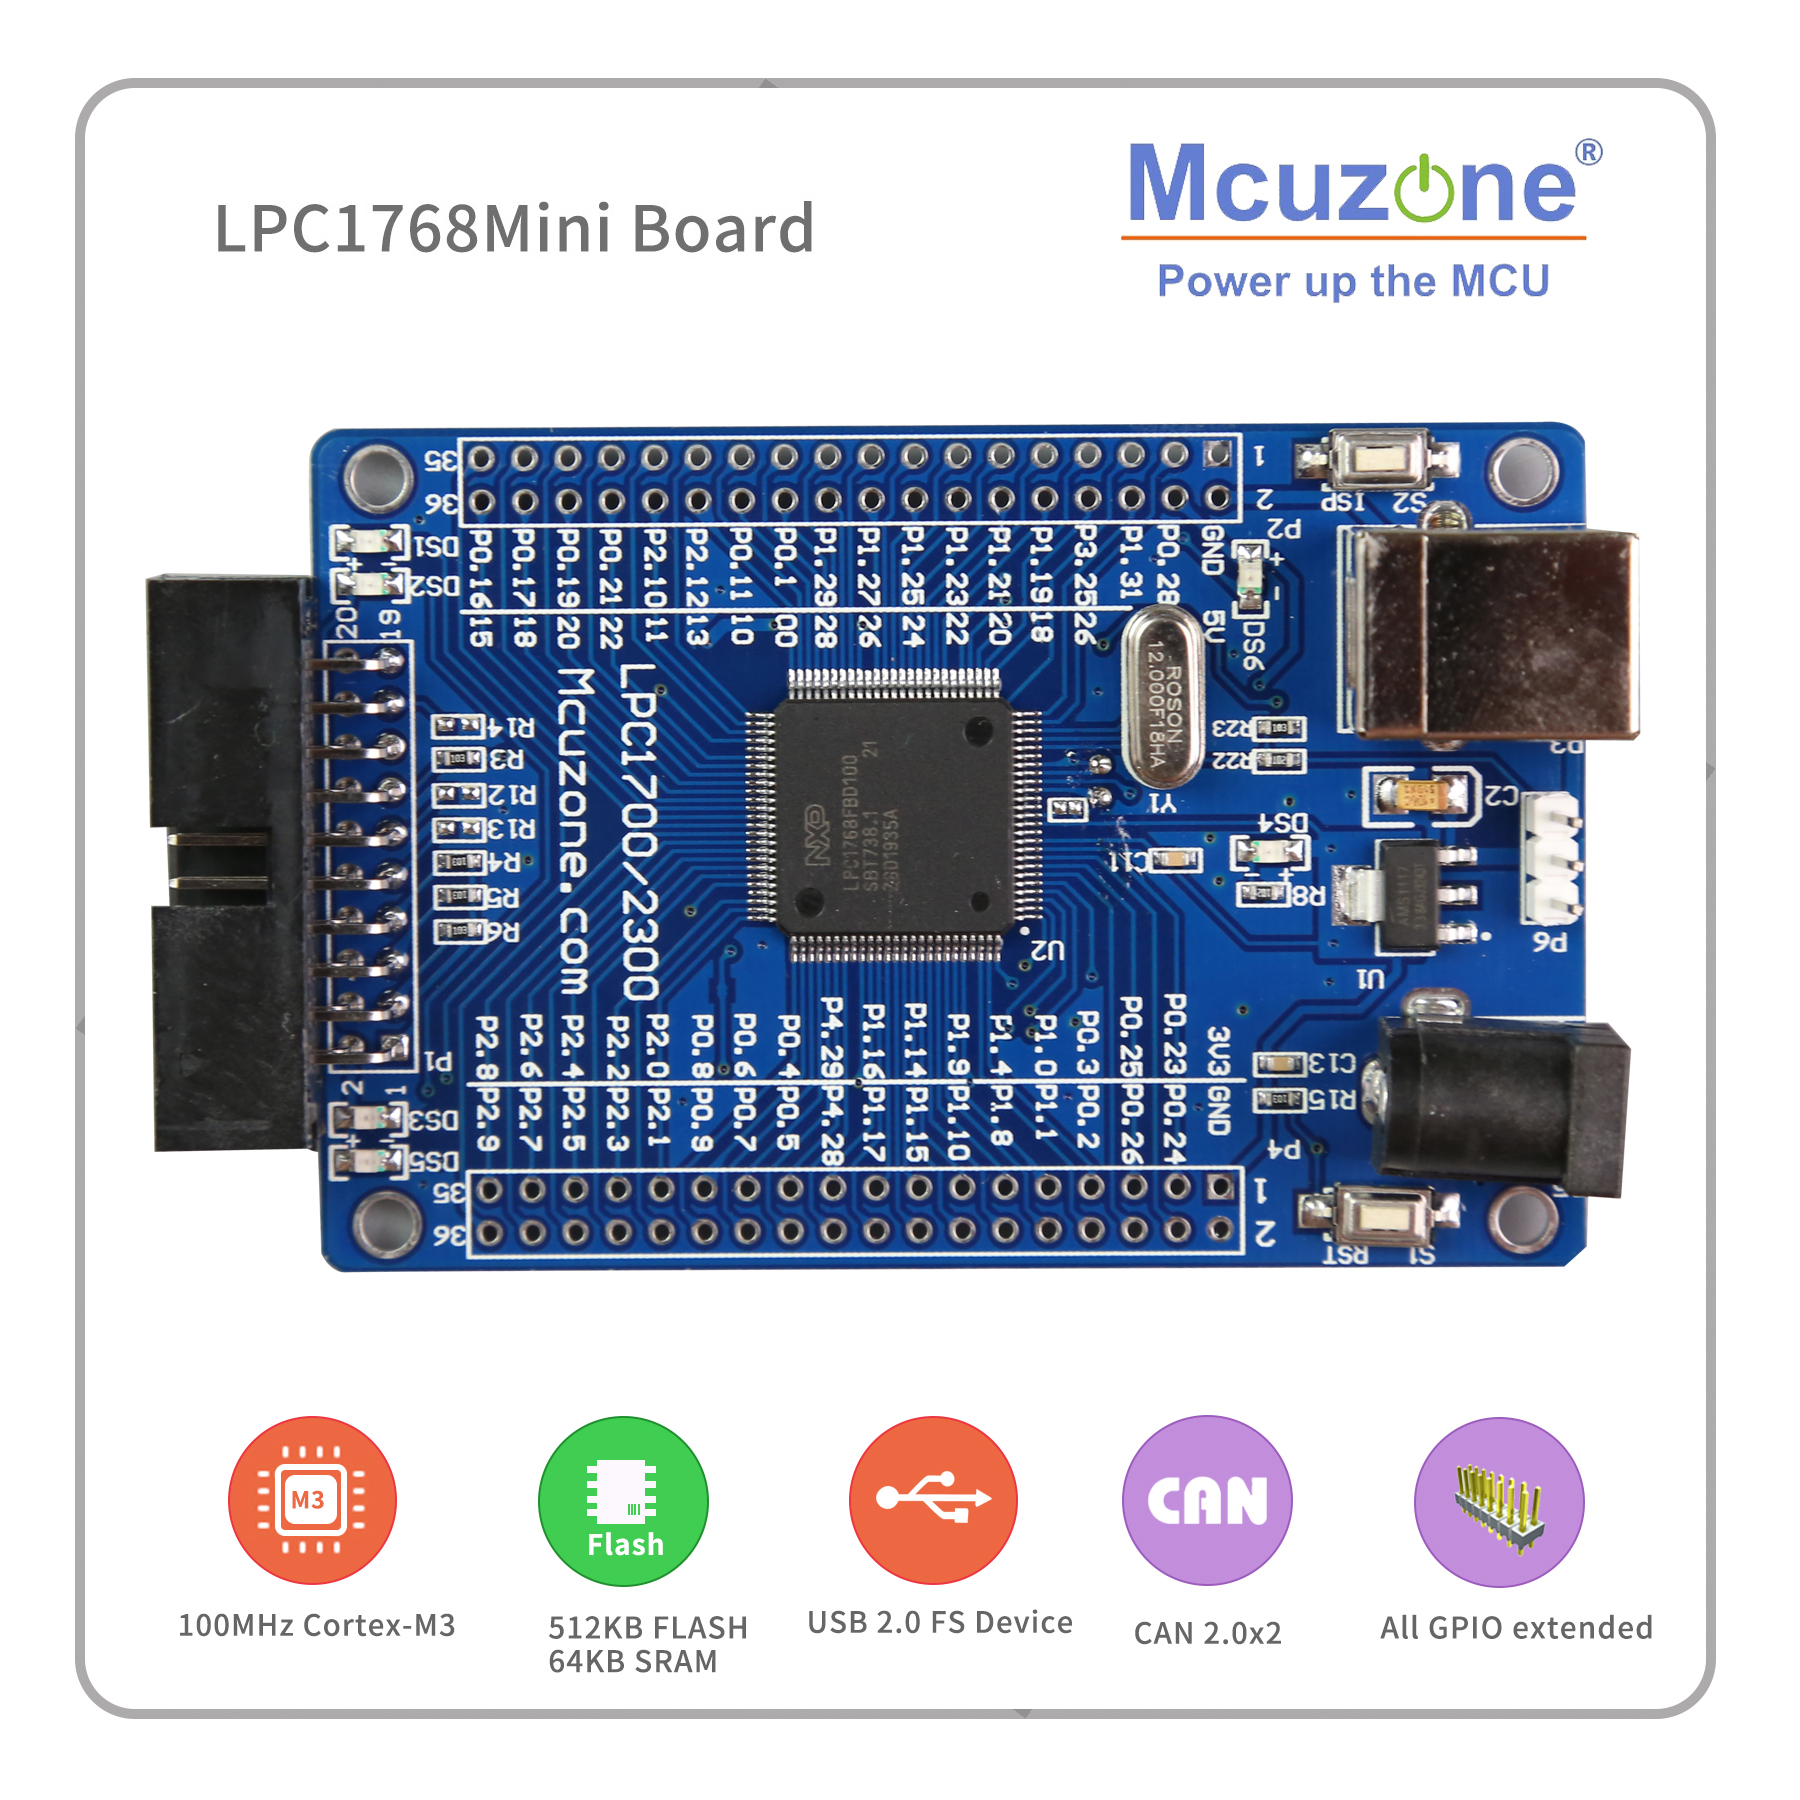 LPC1768 Mini Board  100MHz Cortex-M3, USB, EMAC, UART, SPI, I2C, ADC, DAC, SD NXP GPIO CAN